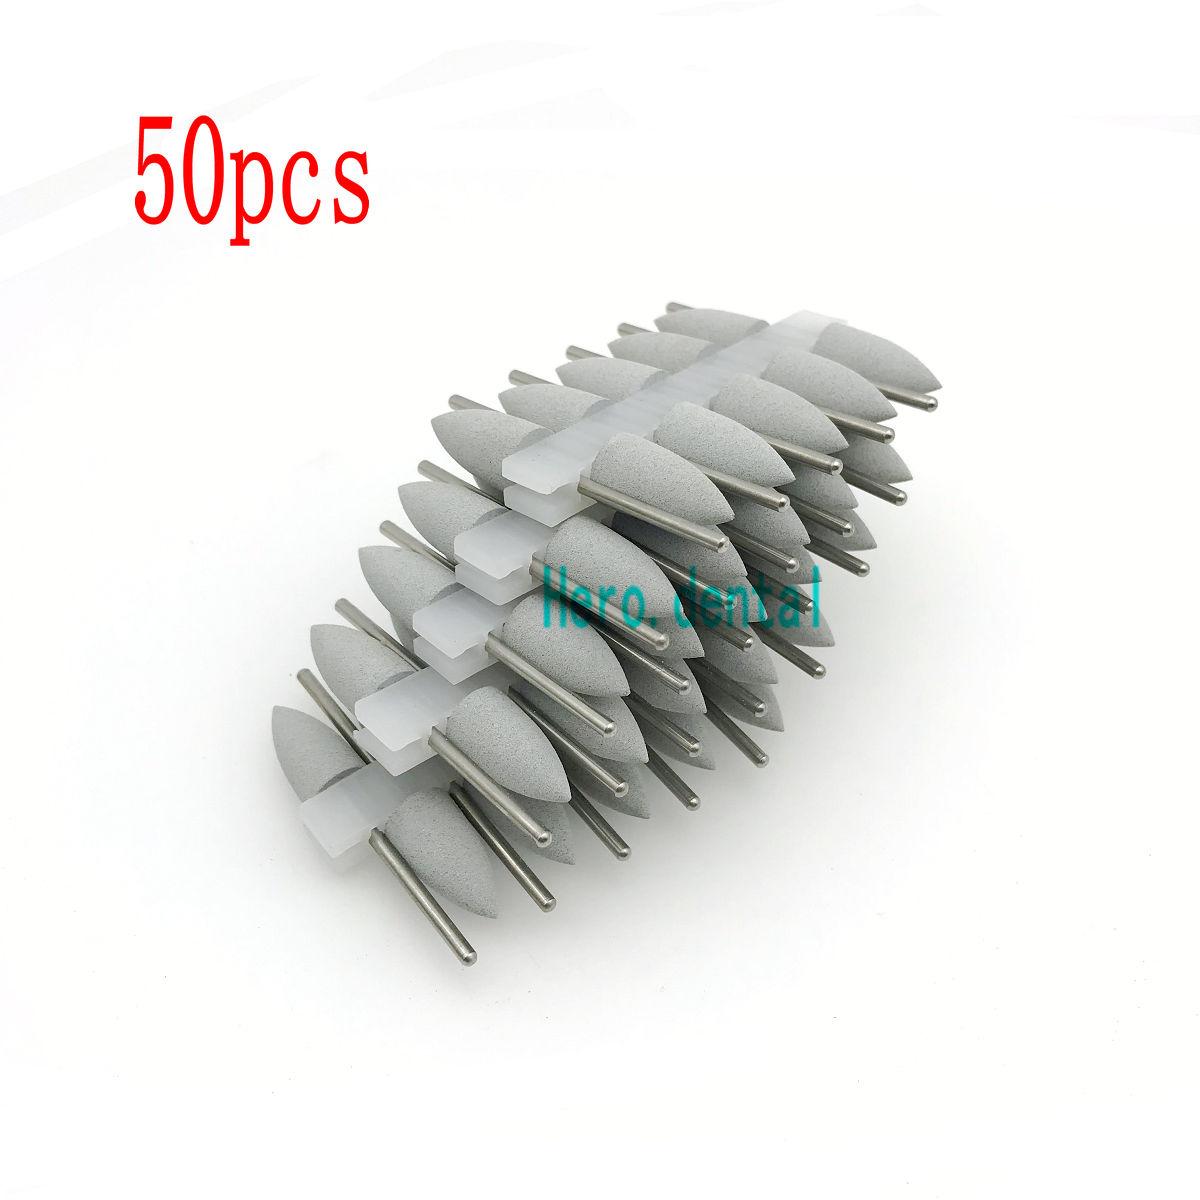 50 Pcs Grey Dental SILICONE Rubber Polishers dental Polishing Burs 2 35mm Shank in Teeth Whitening from Beauty Health